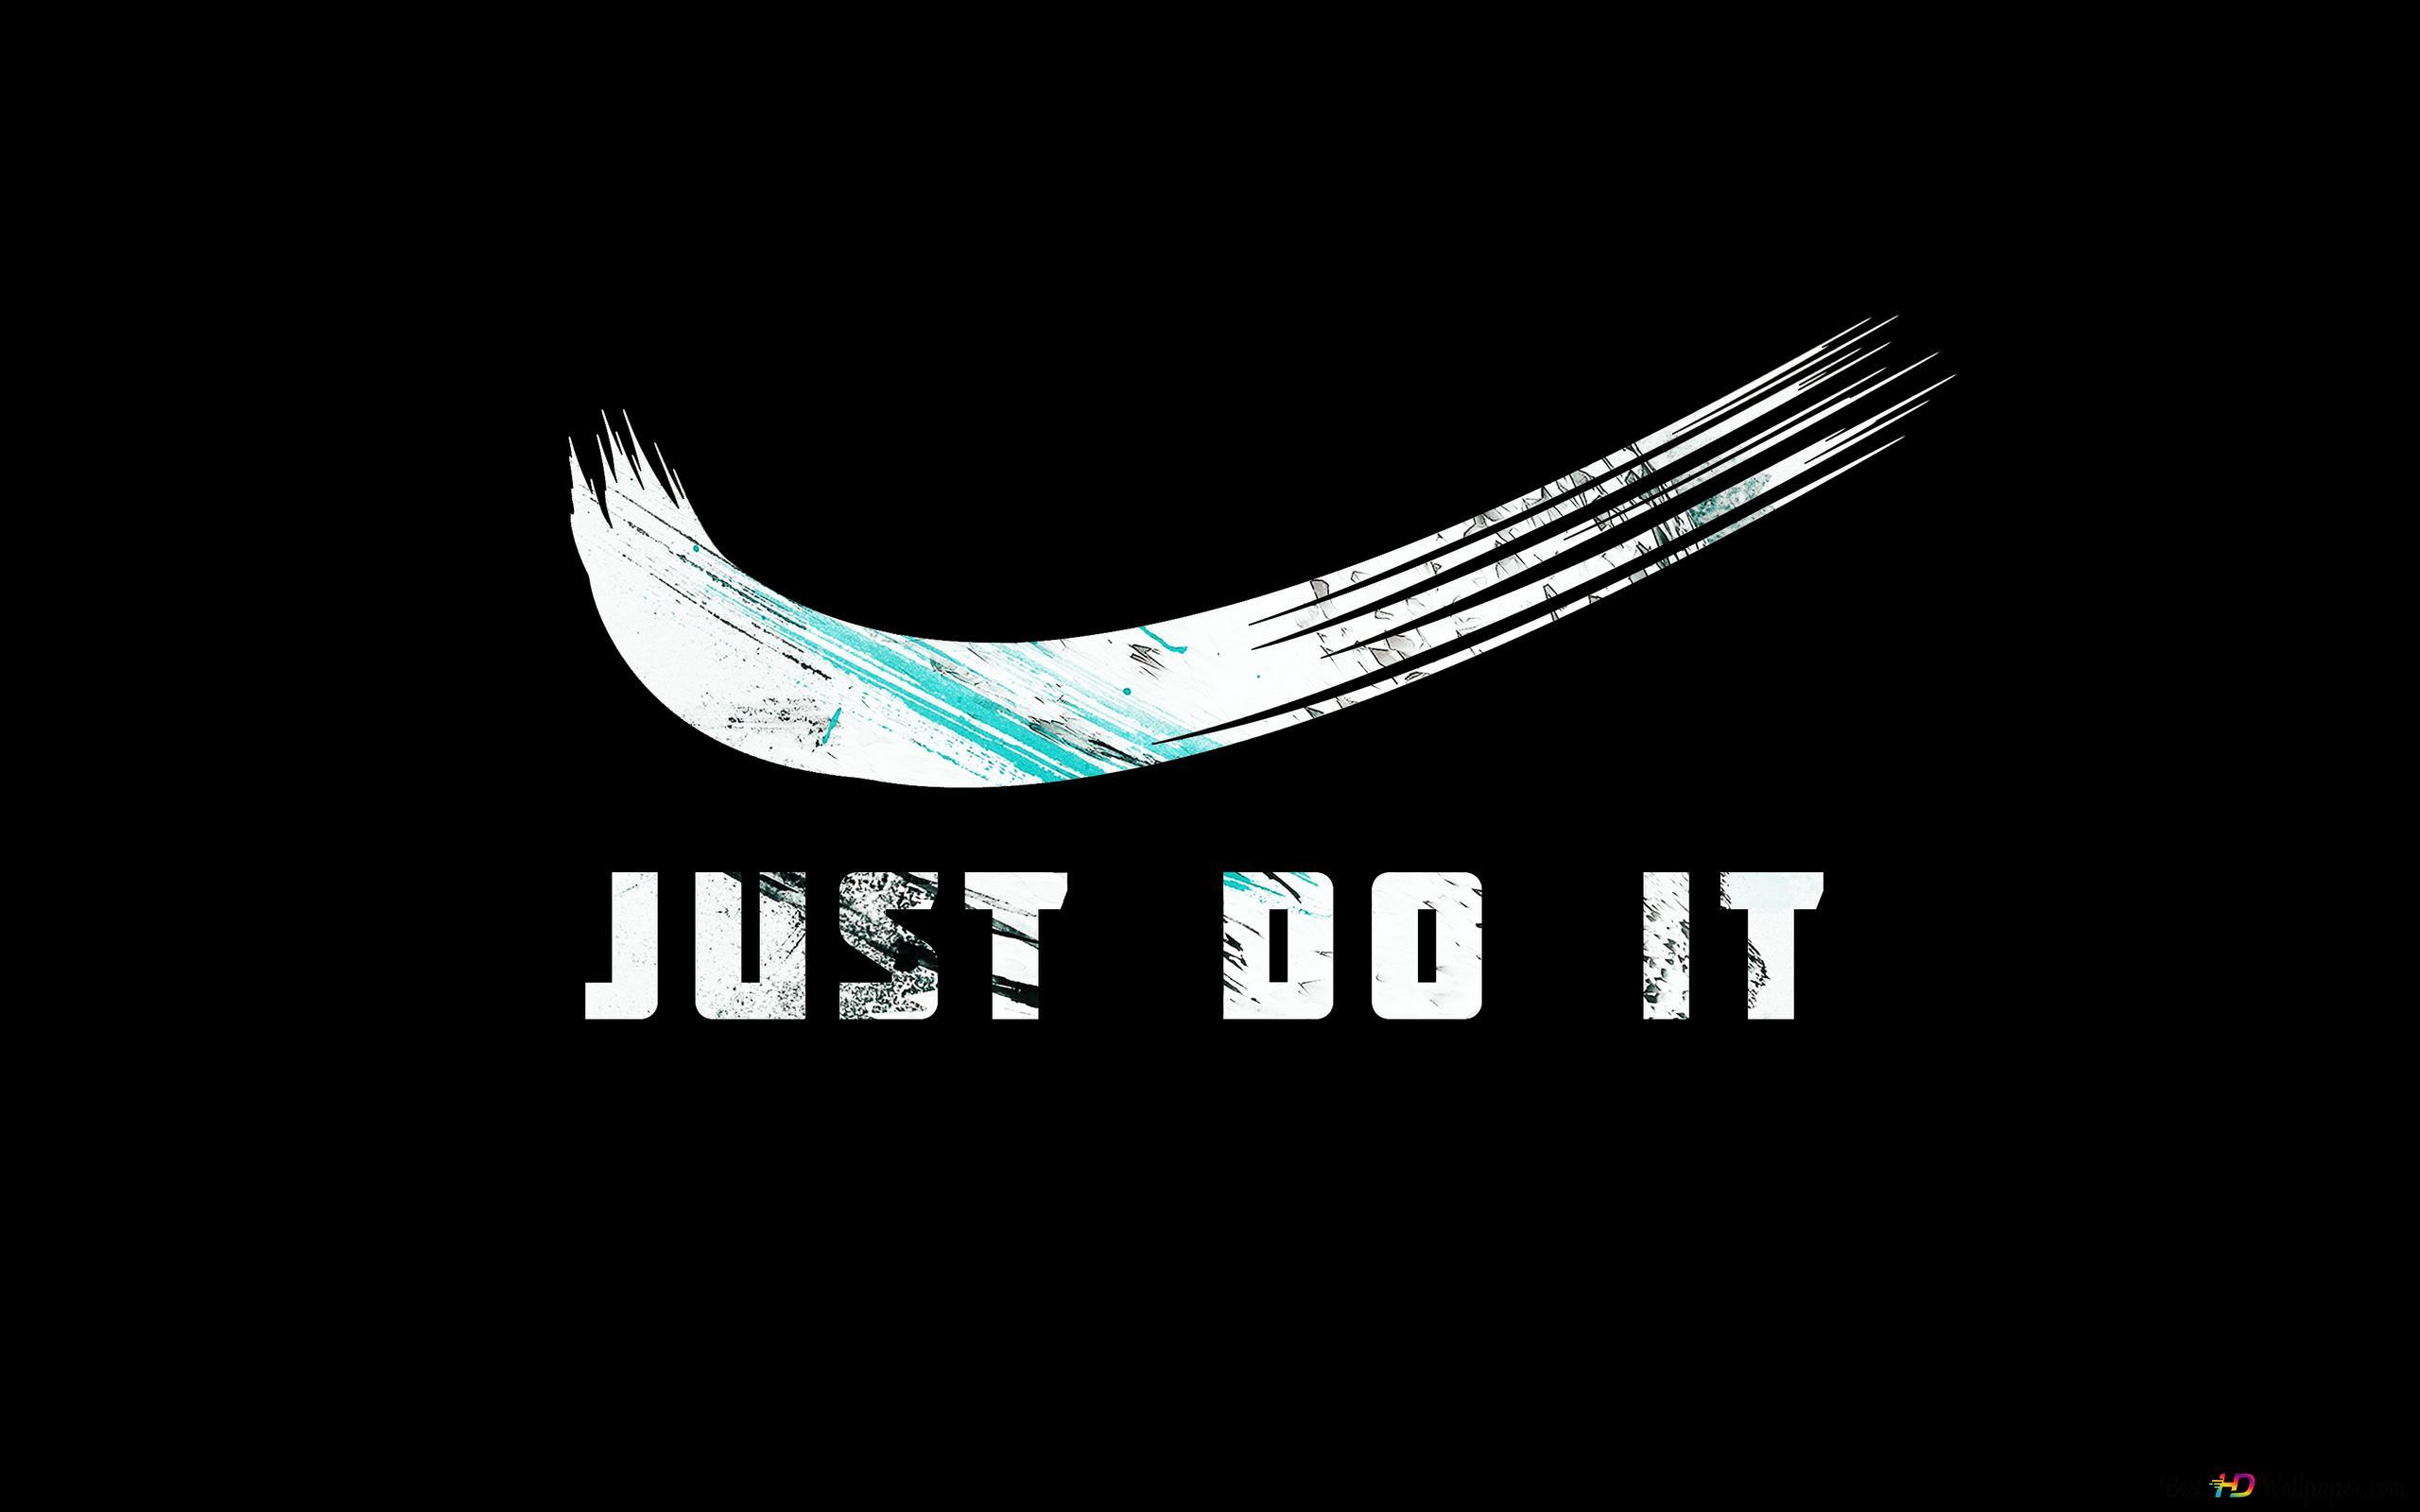 Sport Nike Hd Fond D écran Télécharger